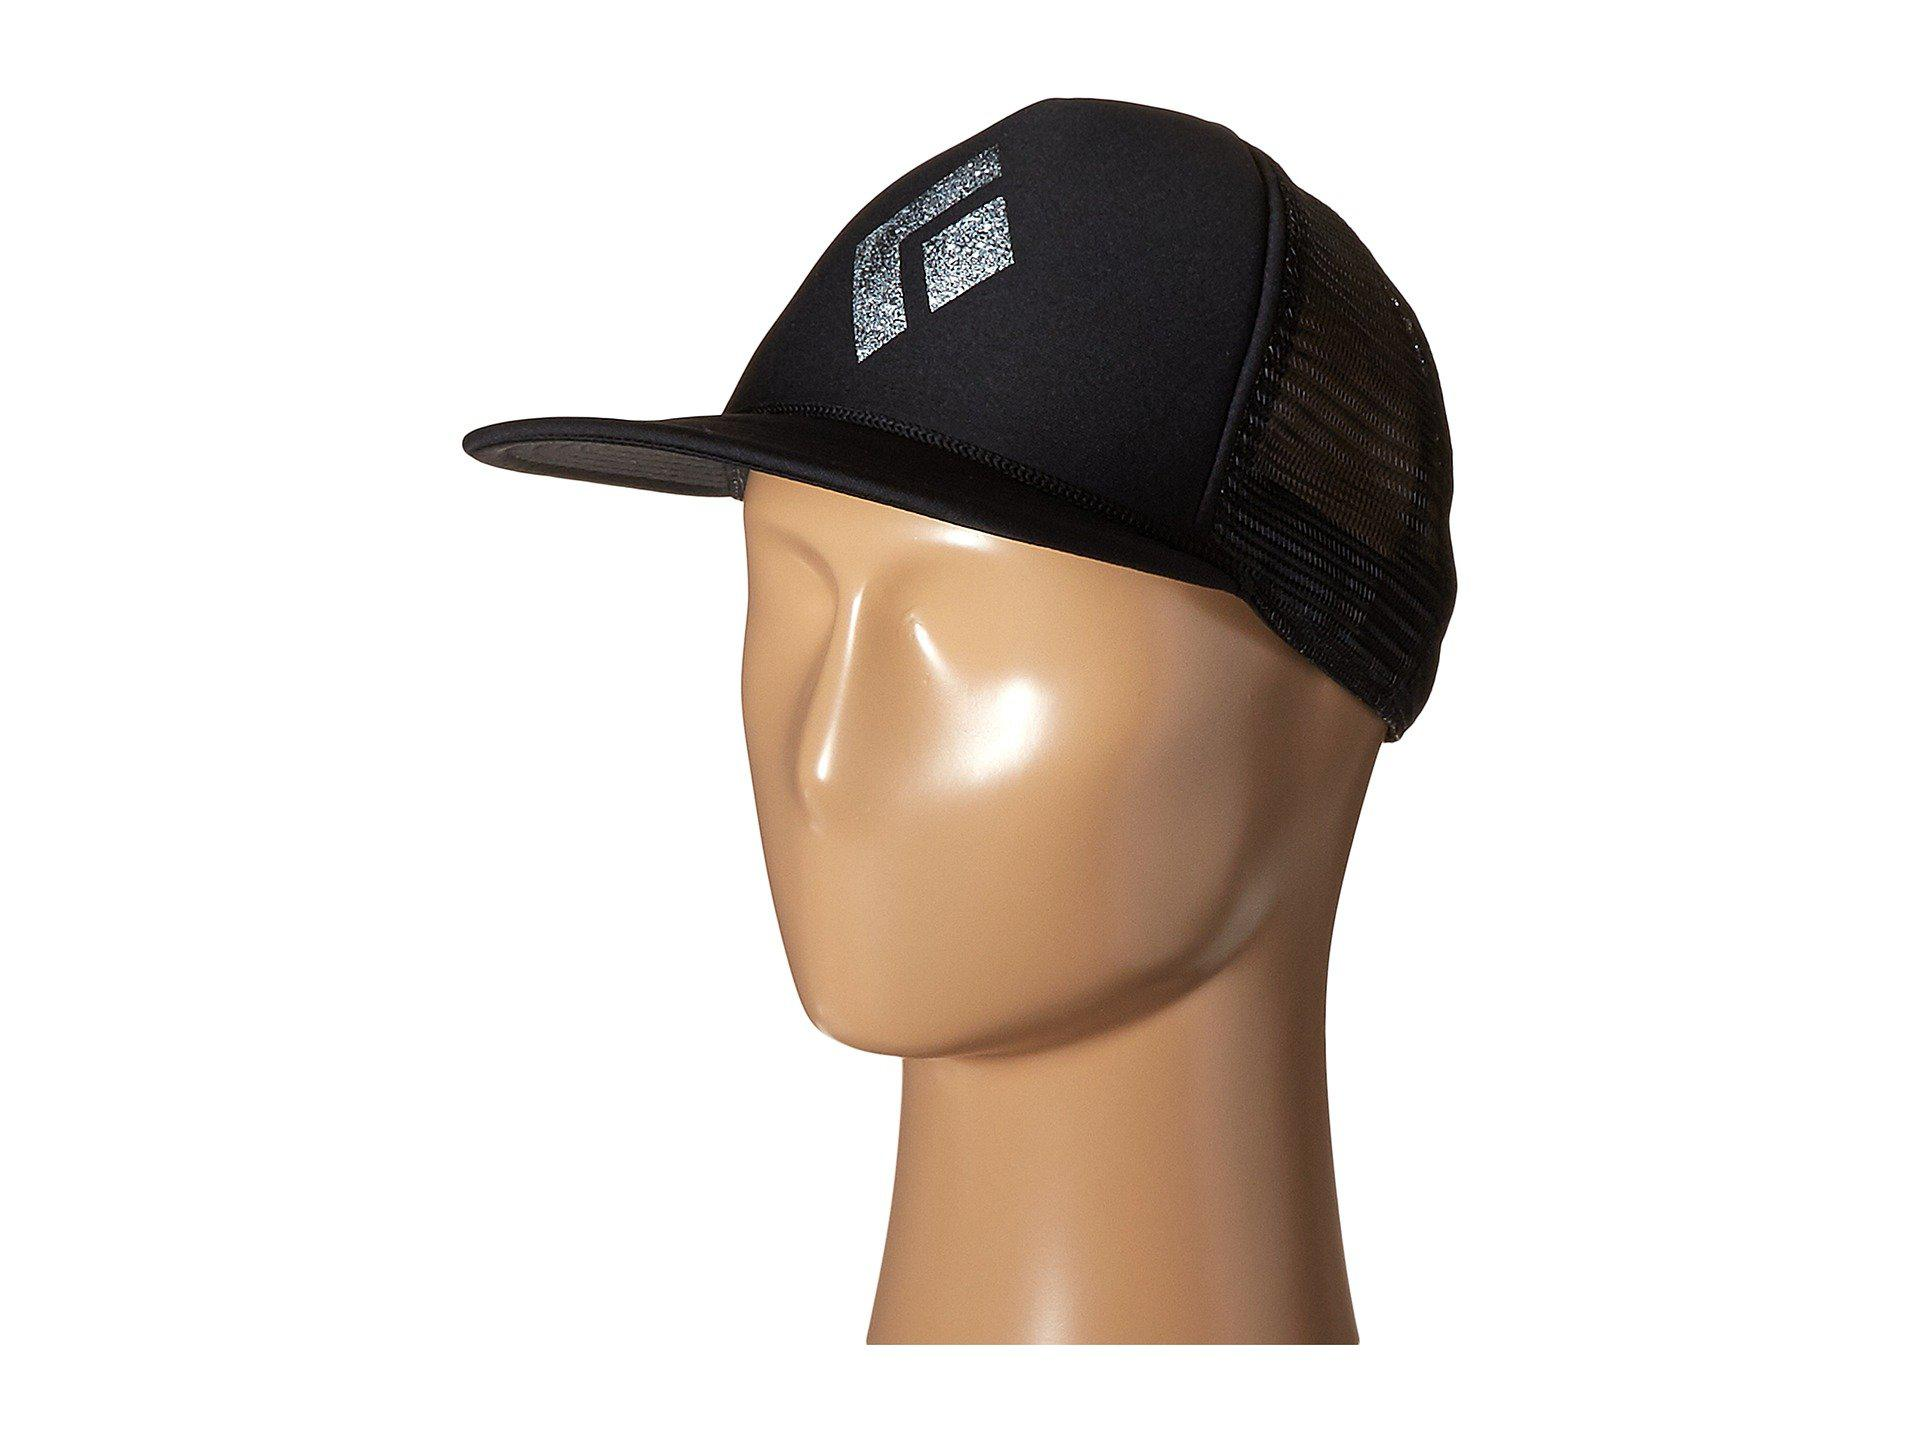 3290a59d3b6 ... usa hats the largest selection of streetwear hats zumiez c5dd6 cd7d8